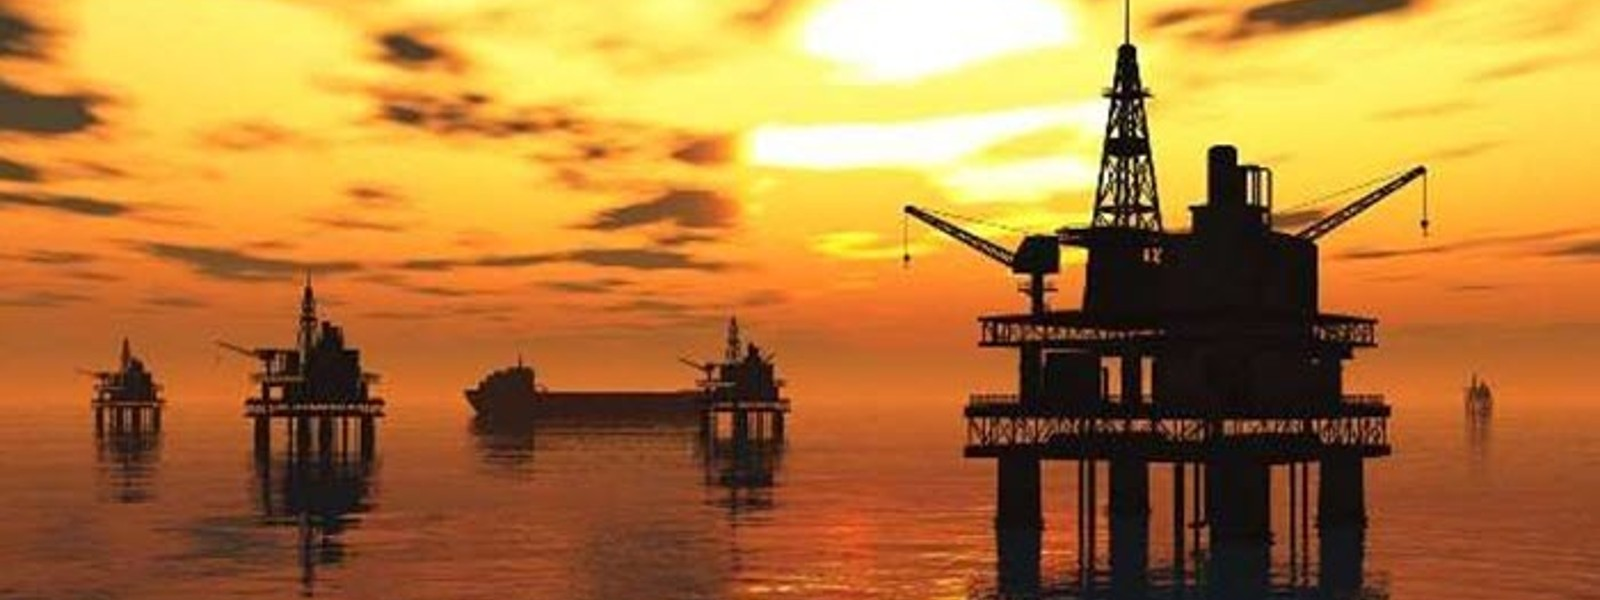 N-W Sea of Sri Lanka: An emerging Geopolitical Hotspot?